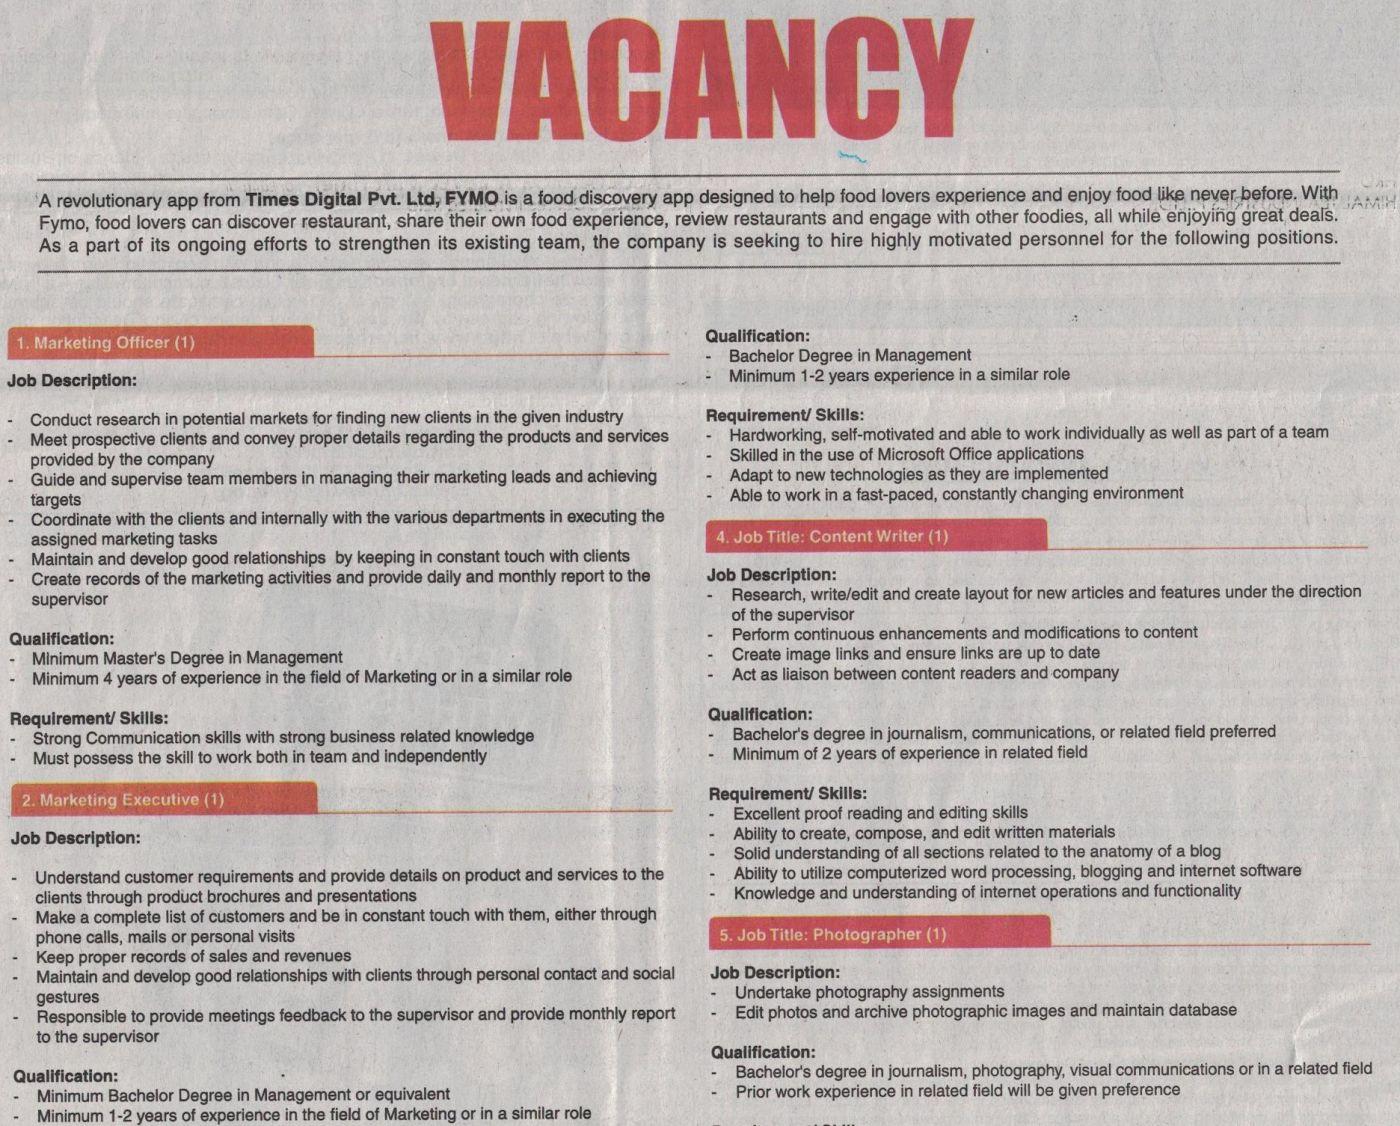 Jobs Nepal - Vacancy - Marketing Officer, Marketing